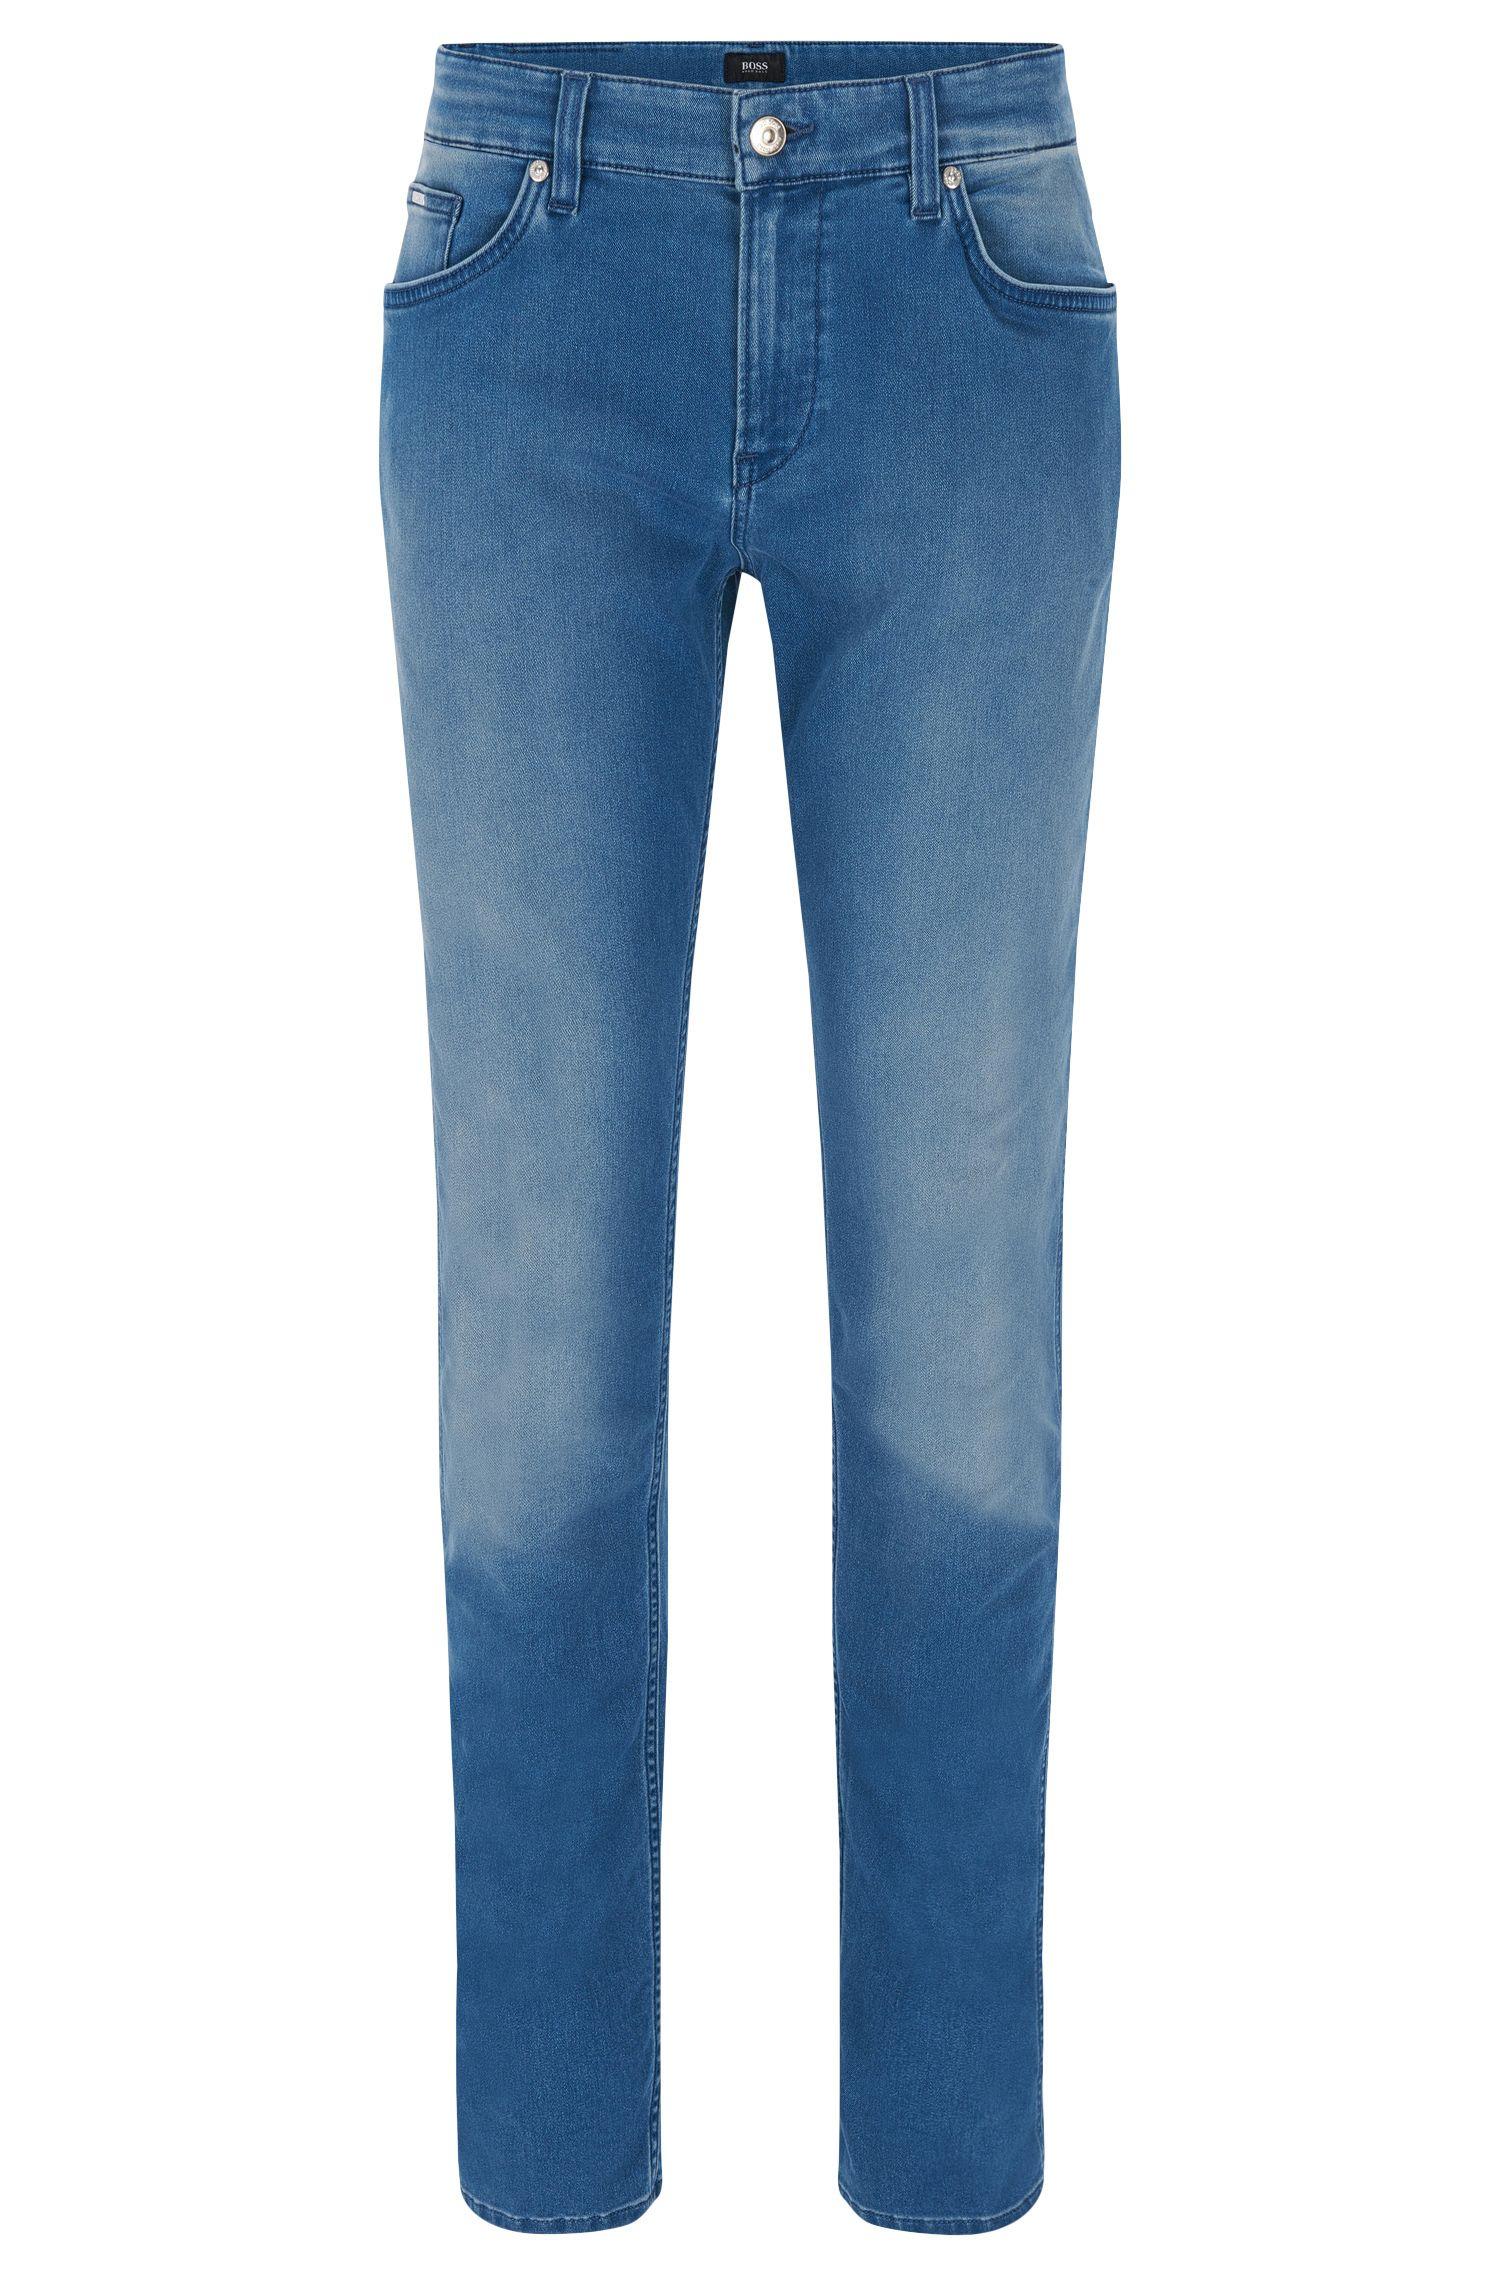 8 oz Stretch Cotton Jeans, Slim Fit   Delaware